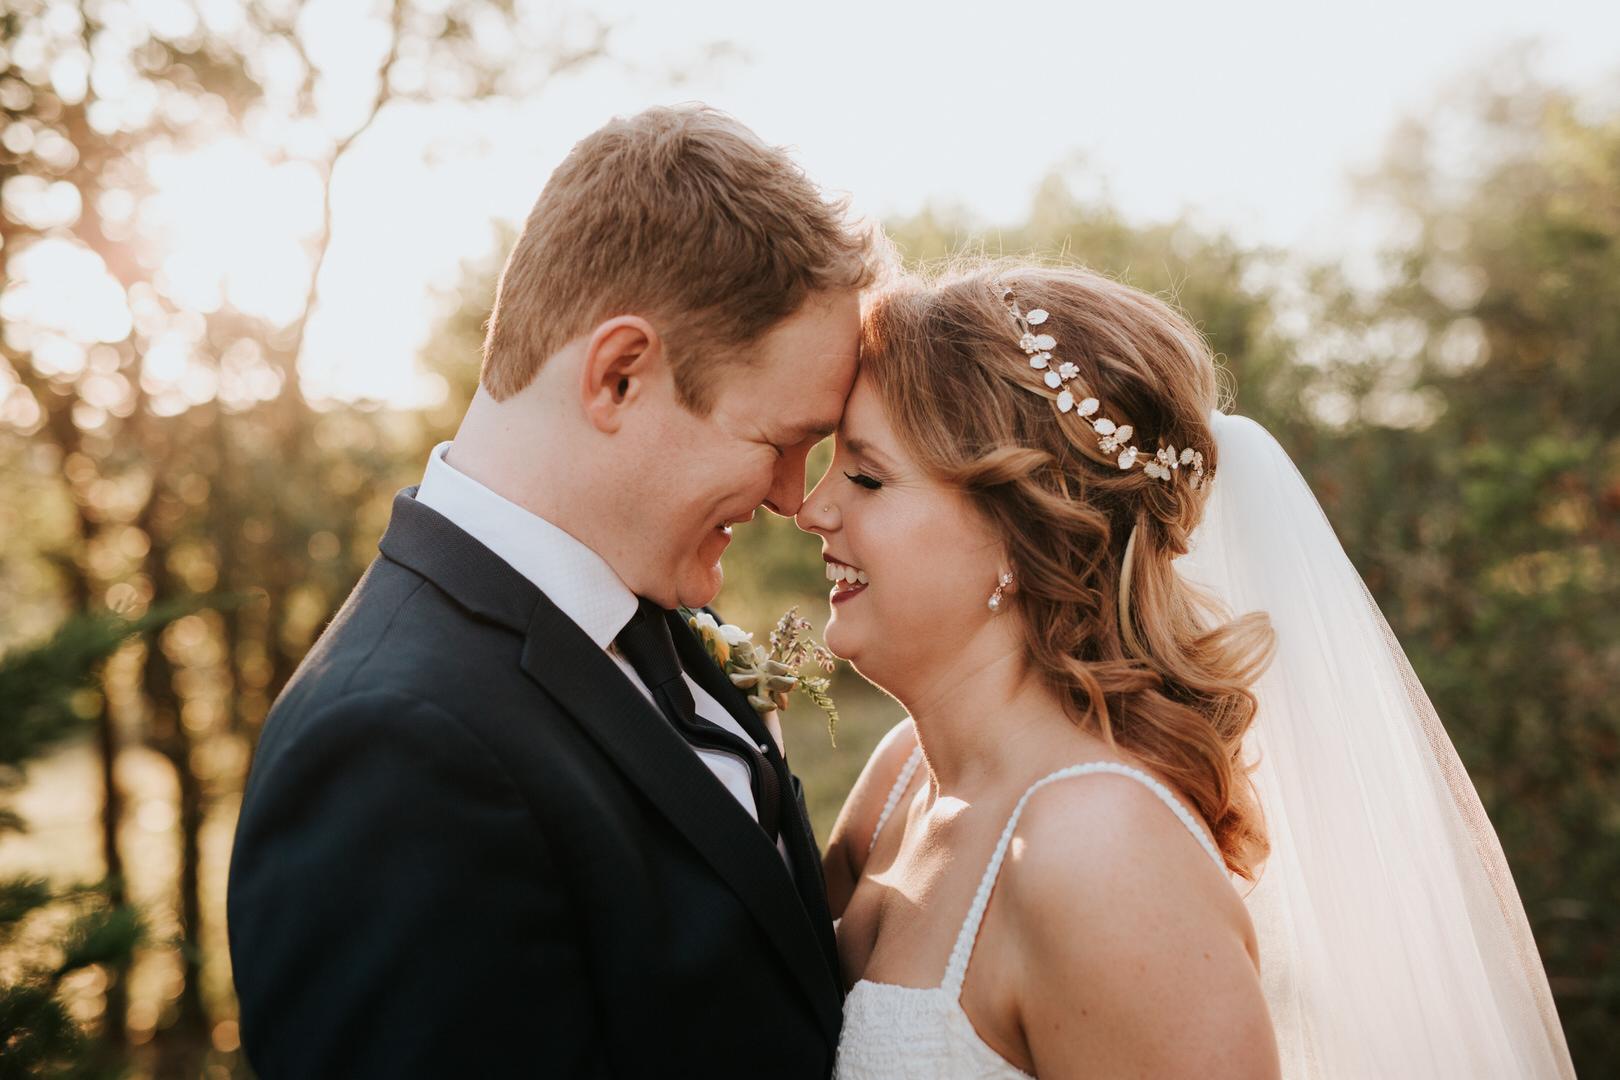 Lexi + Travis Wedding - Diana Ascarrunz Photography-525.jpg